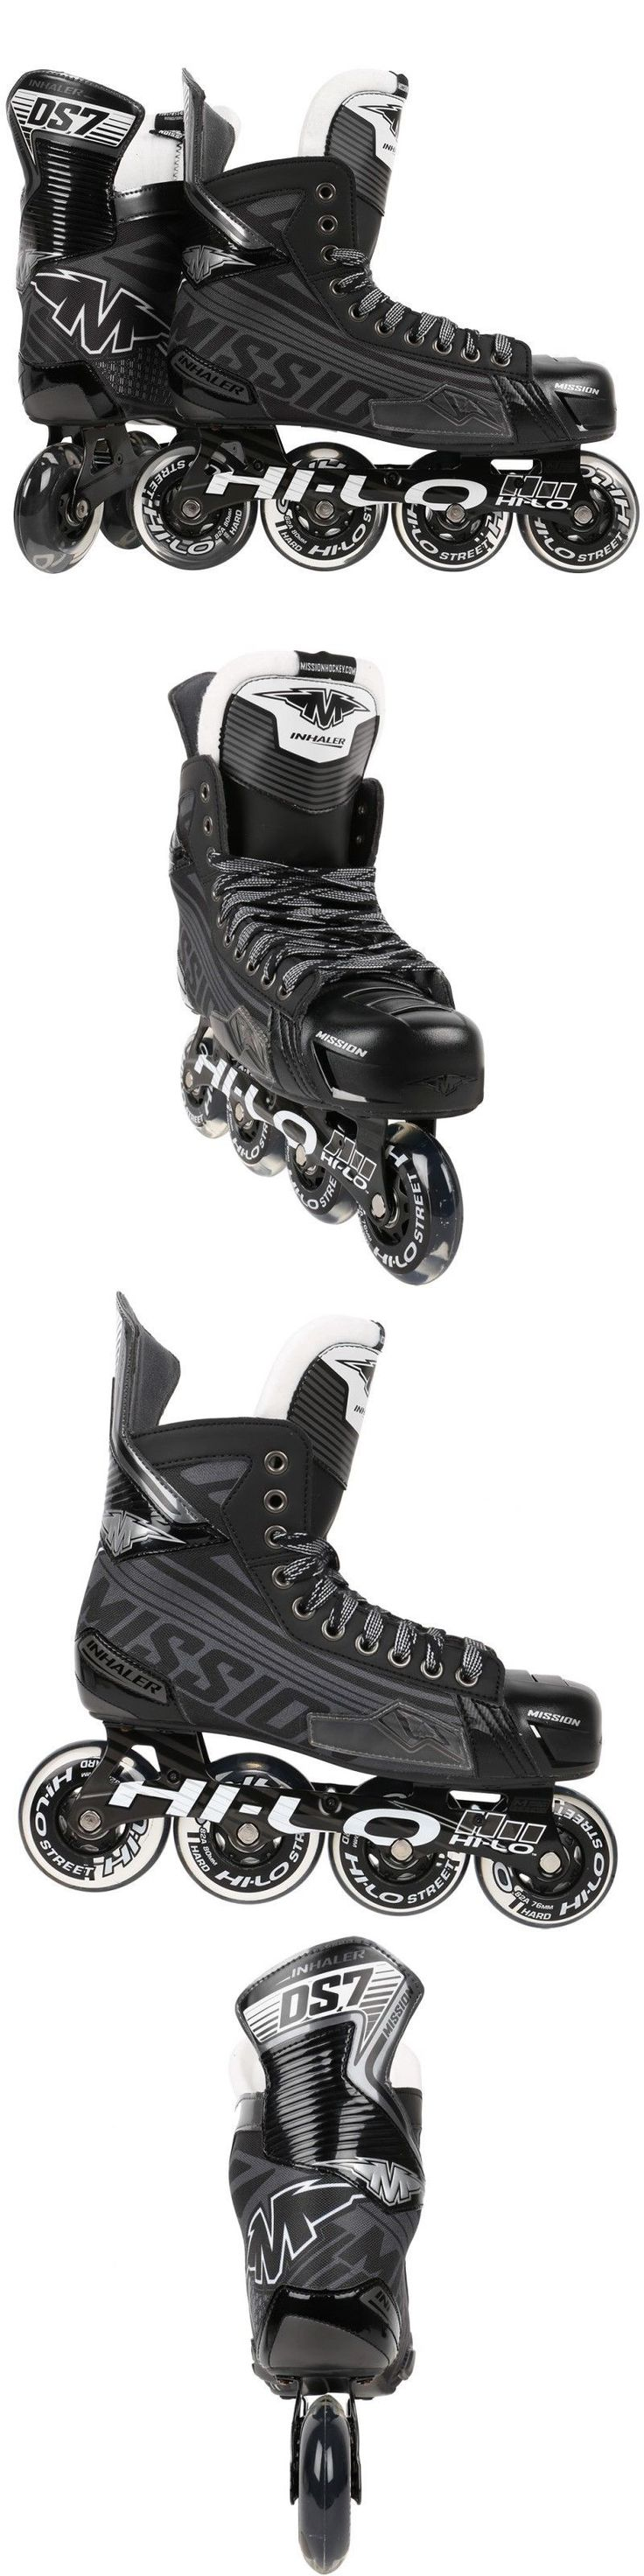 Roller Hockey 64669: Mission Inhaler Ds7 Inline Roller Hockey Skates Black Gray White -> BUY IT NOW ONLY: $150 on eBay!